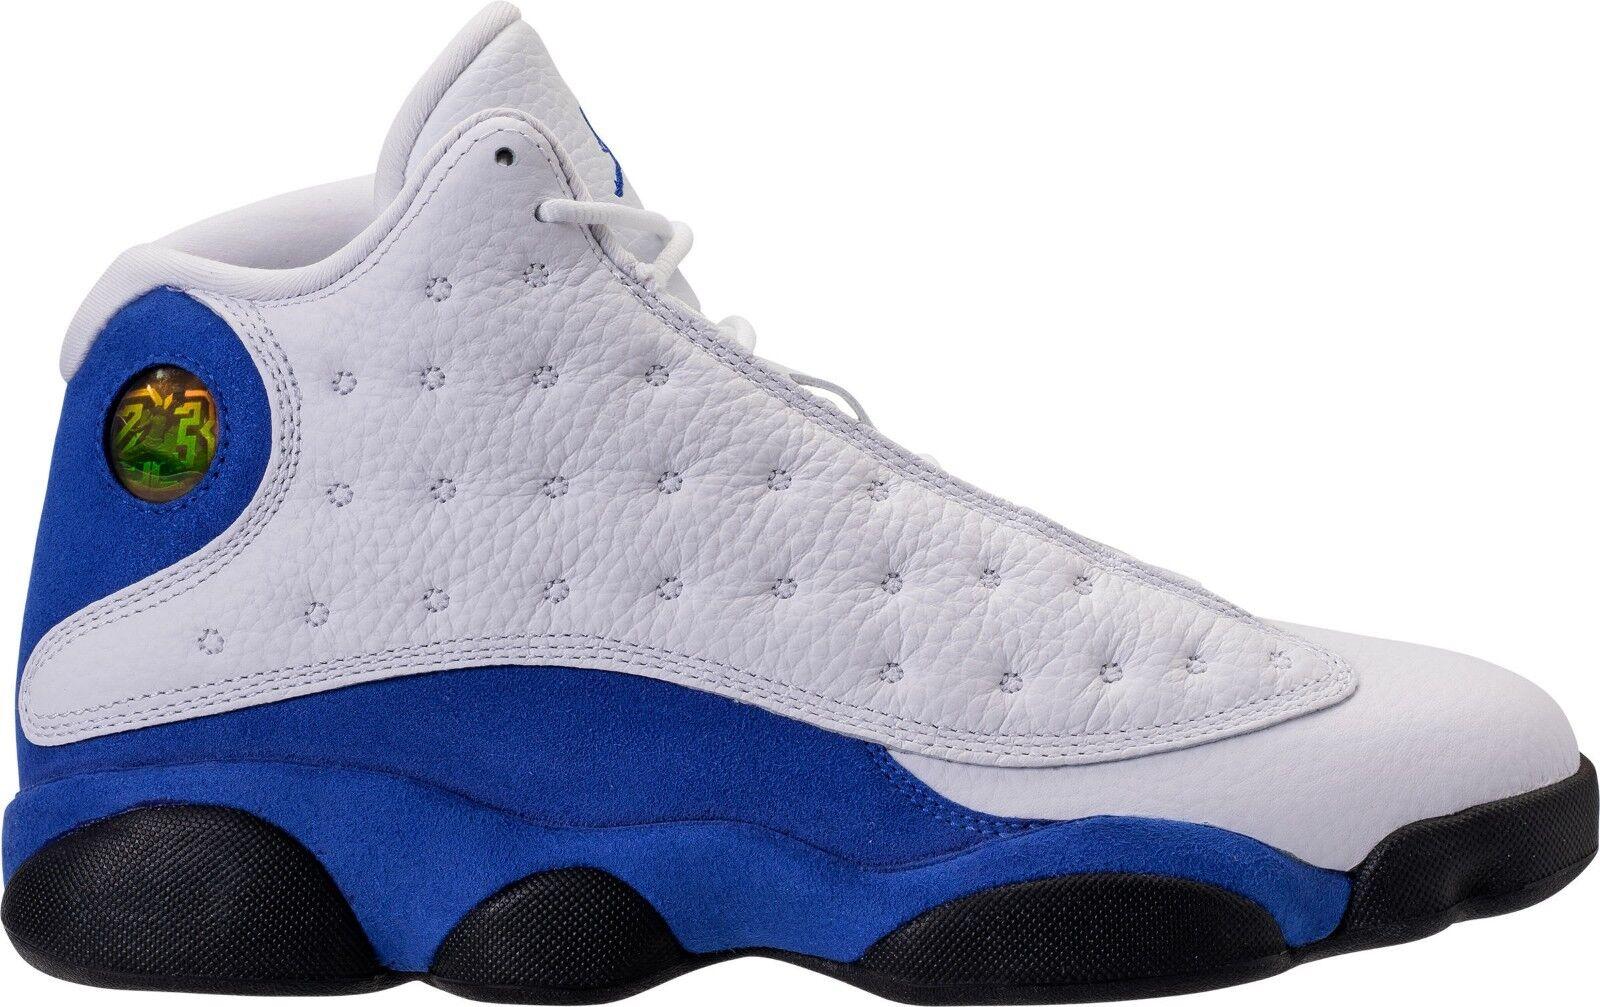 Nike Air Jordan Retro 13 Hyper Royal 414571-117 Mens 414575-117 PS Blue 3C - 15 The latest discount shoes for men and women